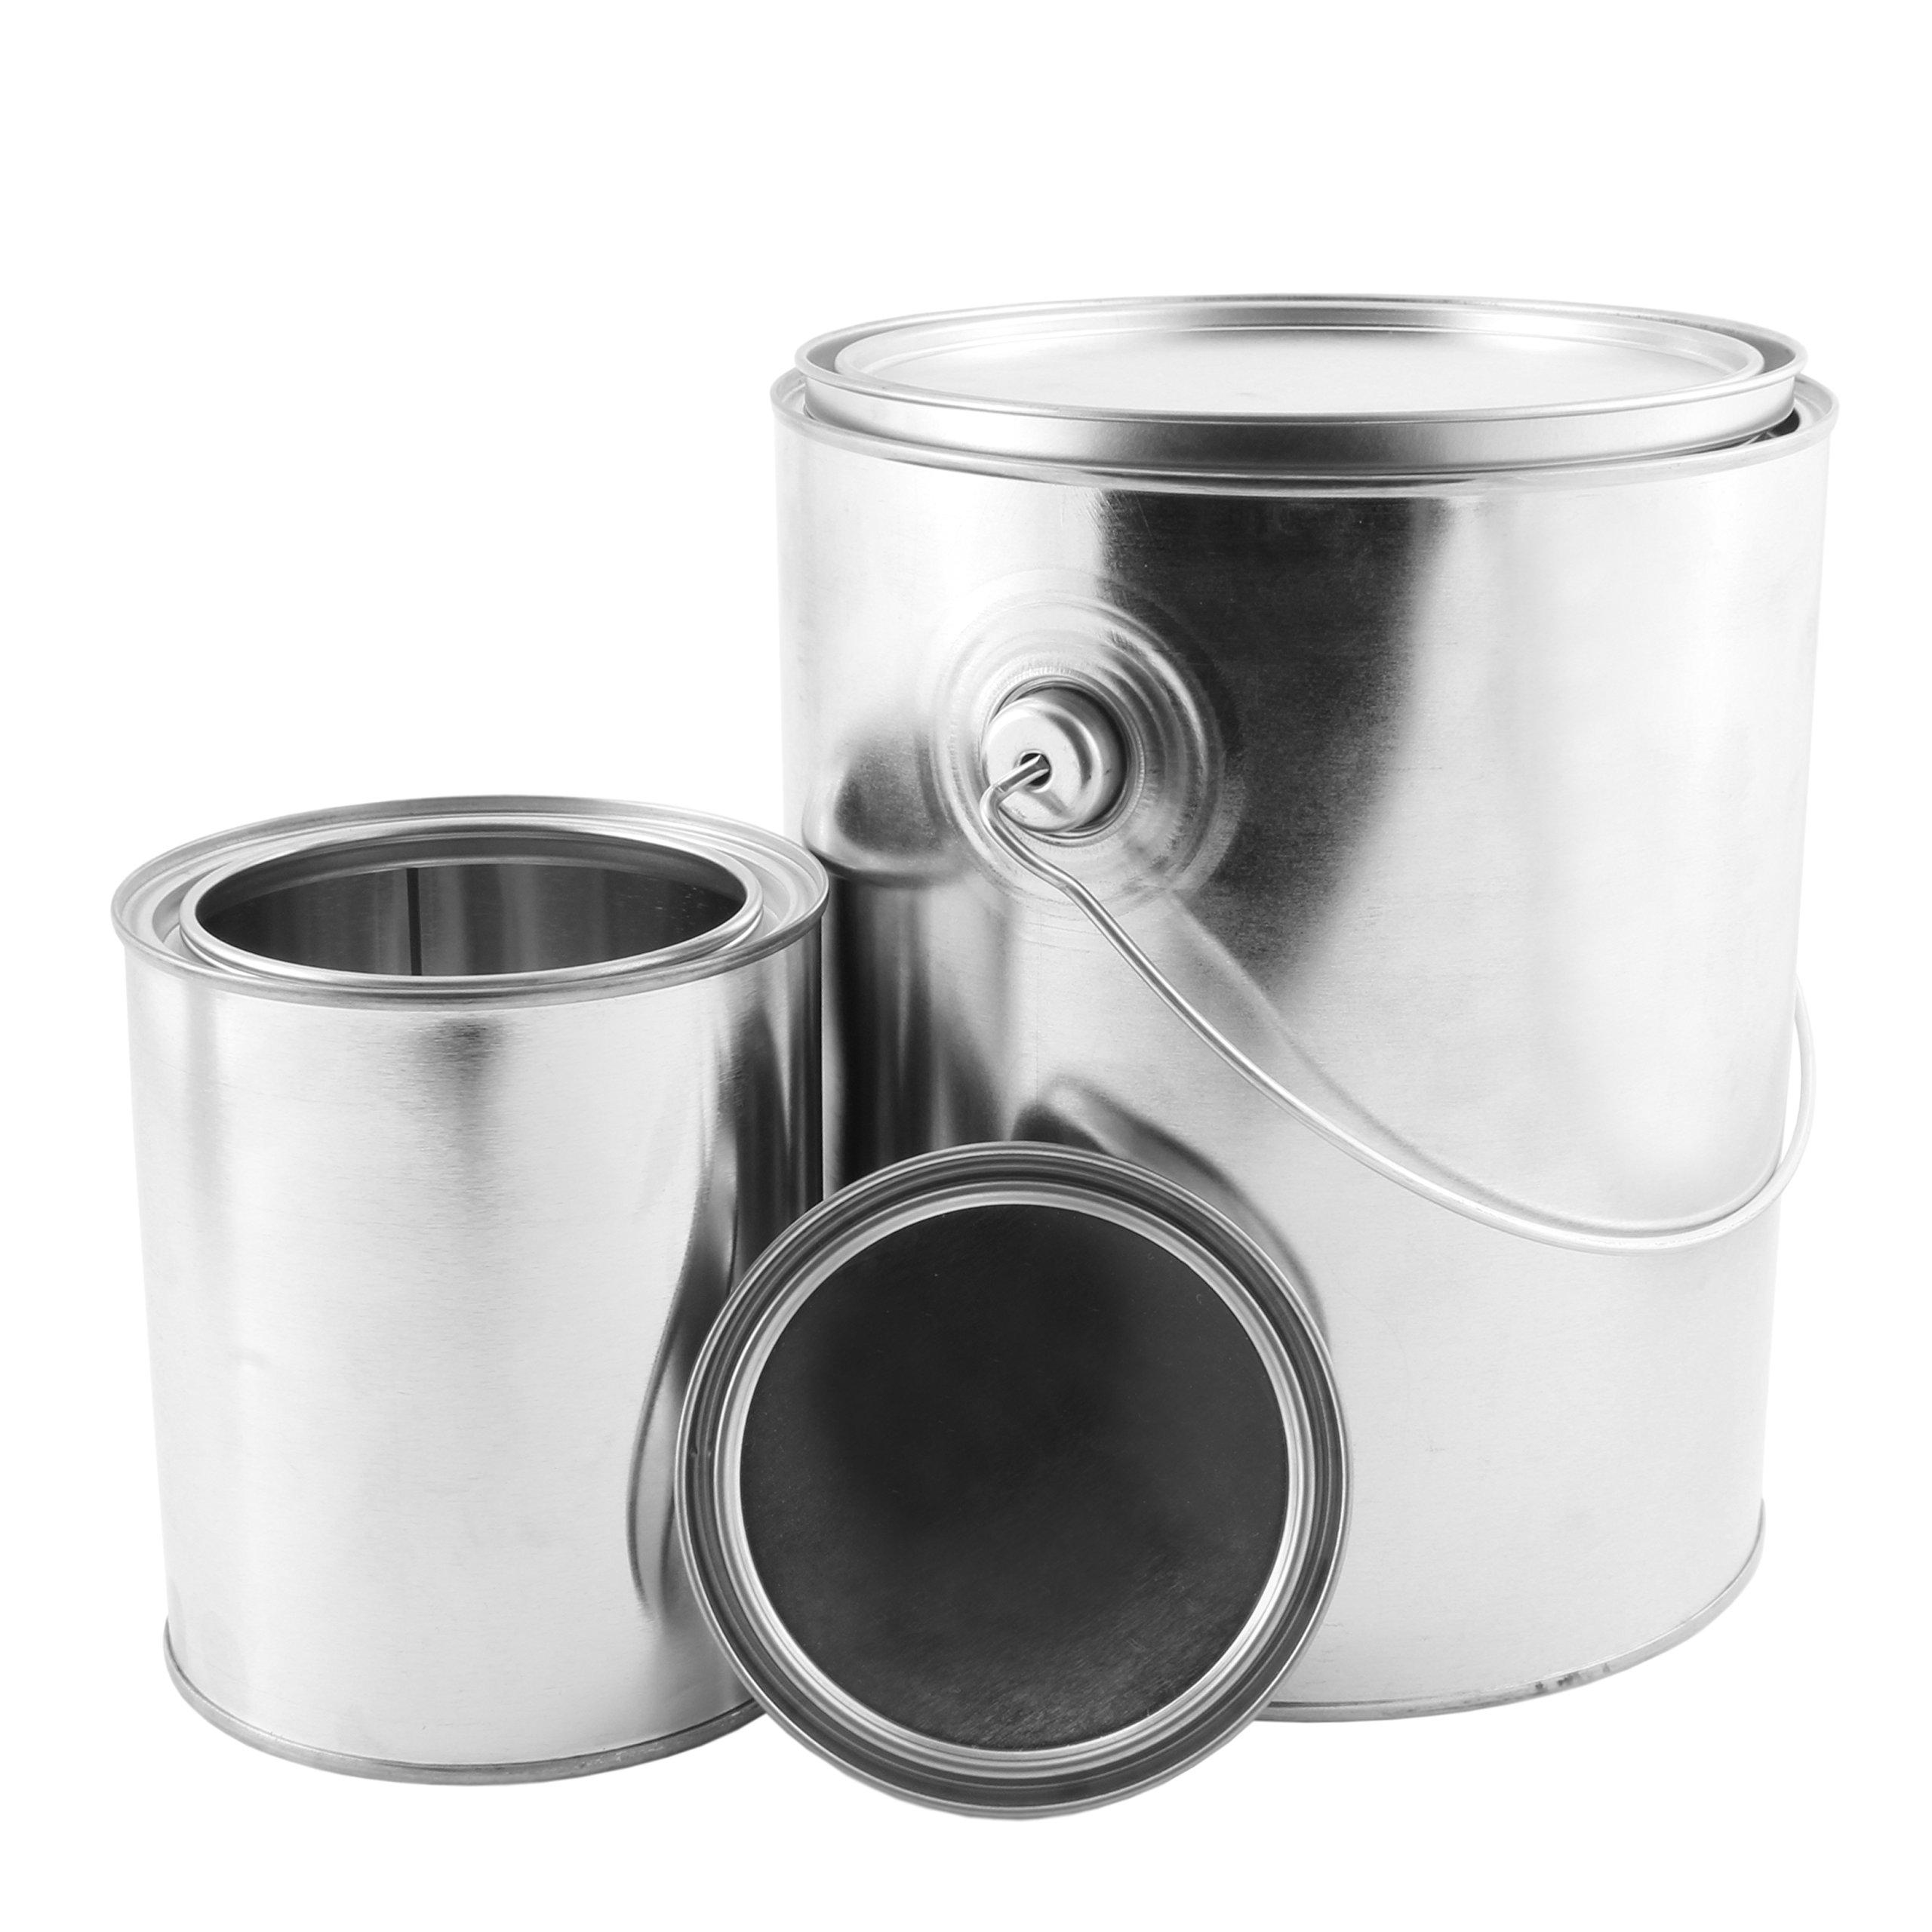 1 Gallon Empty Paint Can + 1 Quart Empty Paint Can (Combo 2-Pack); Unlined Metal Cans w/Lids by Cornucopia Brands